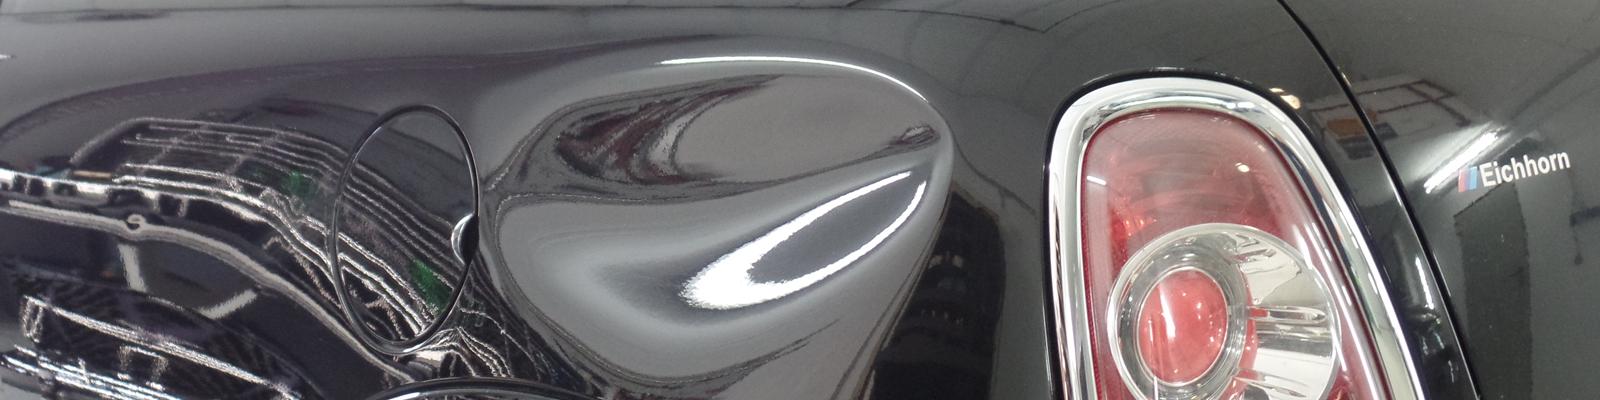 Autoaufbereitung-Kempf-Slide05